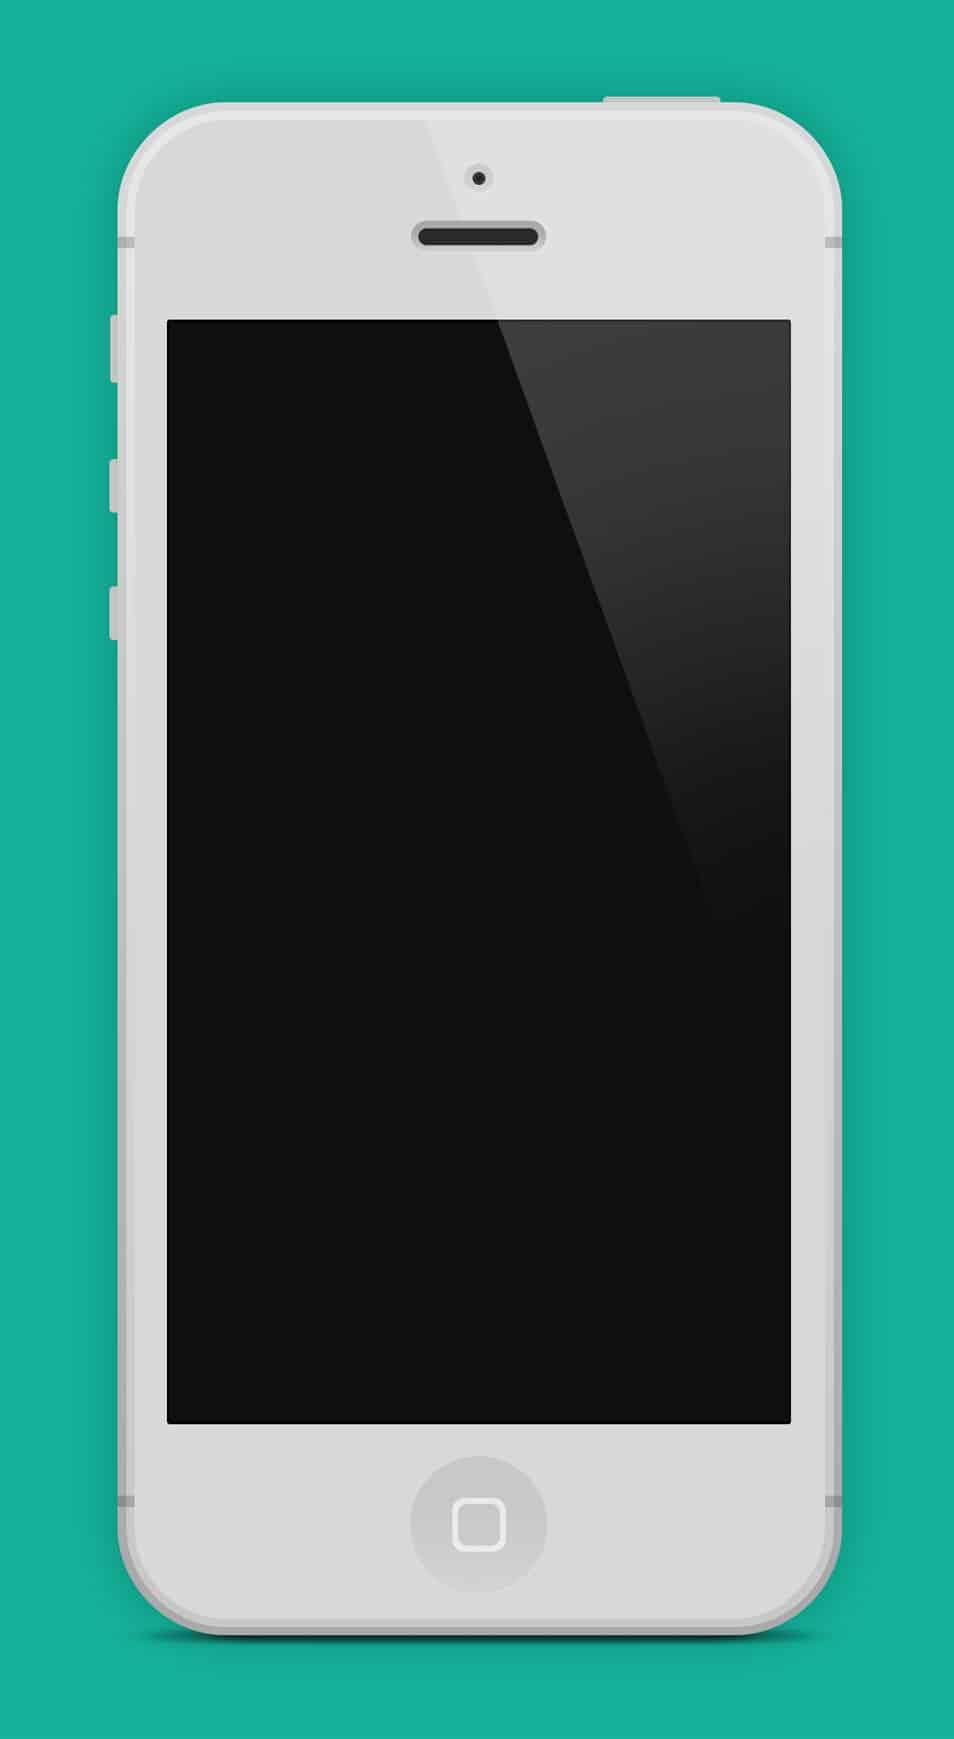 Flat iPhone 5 Black & White - PSD